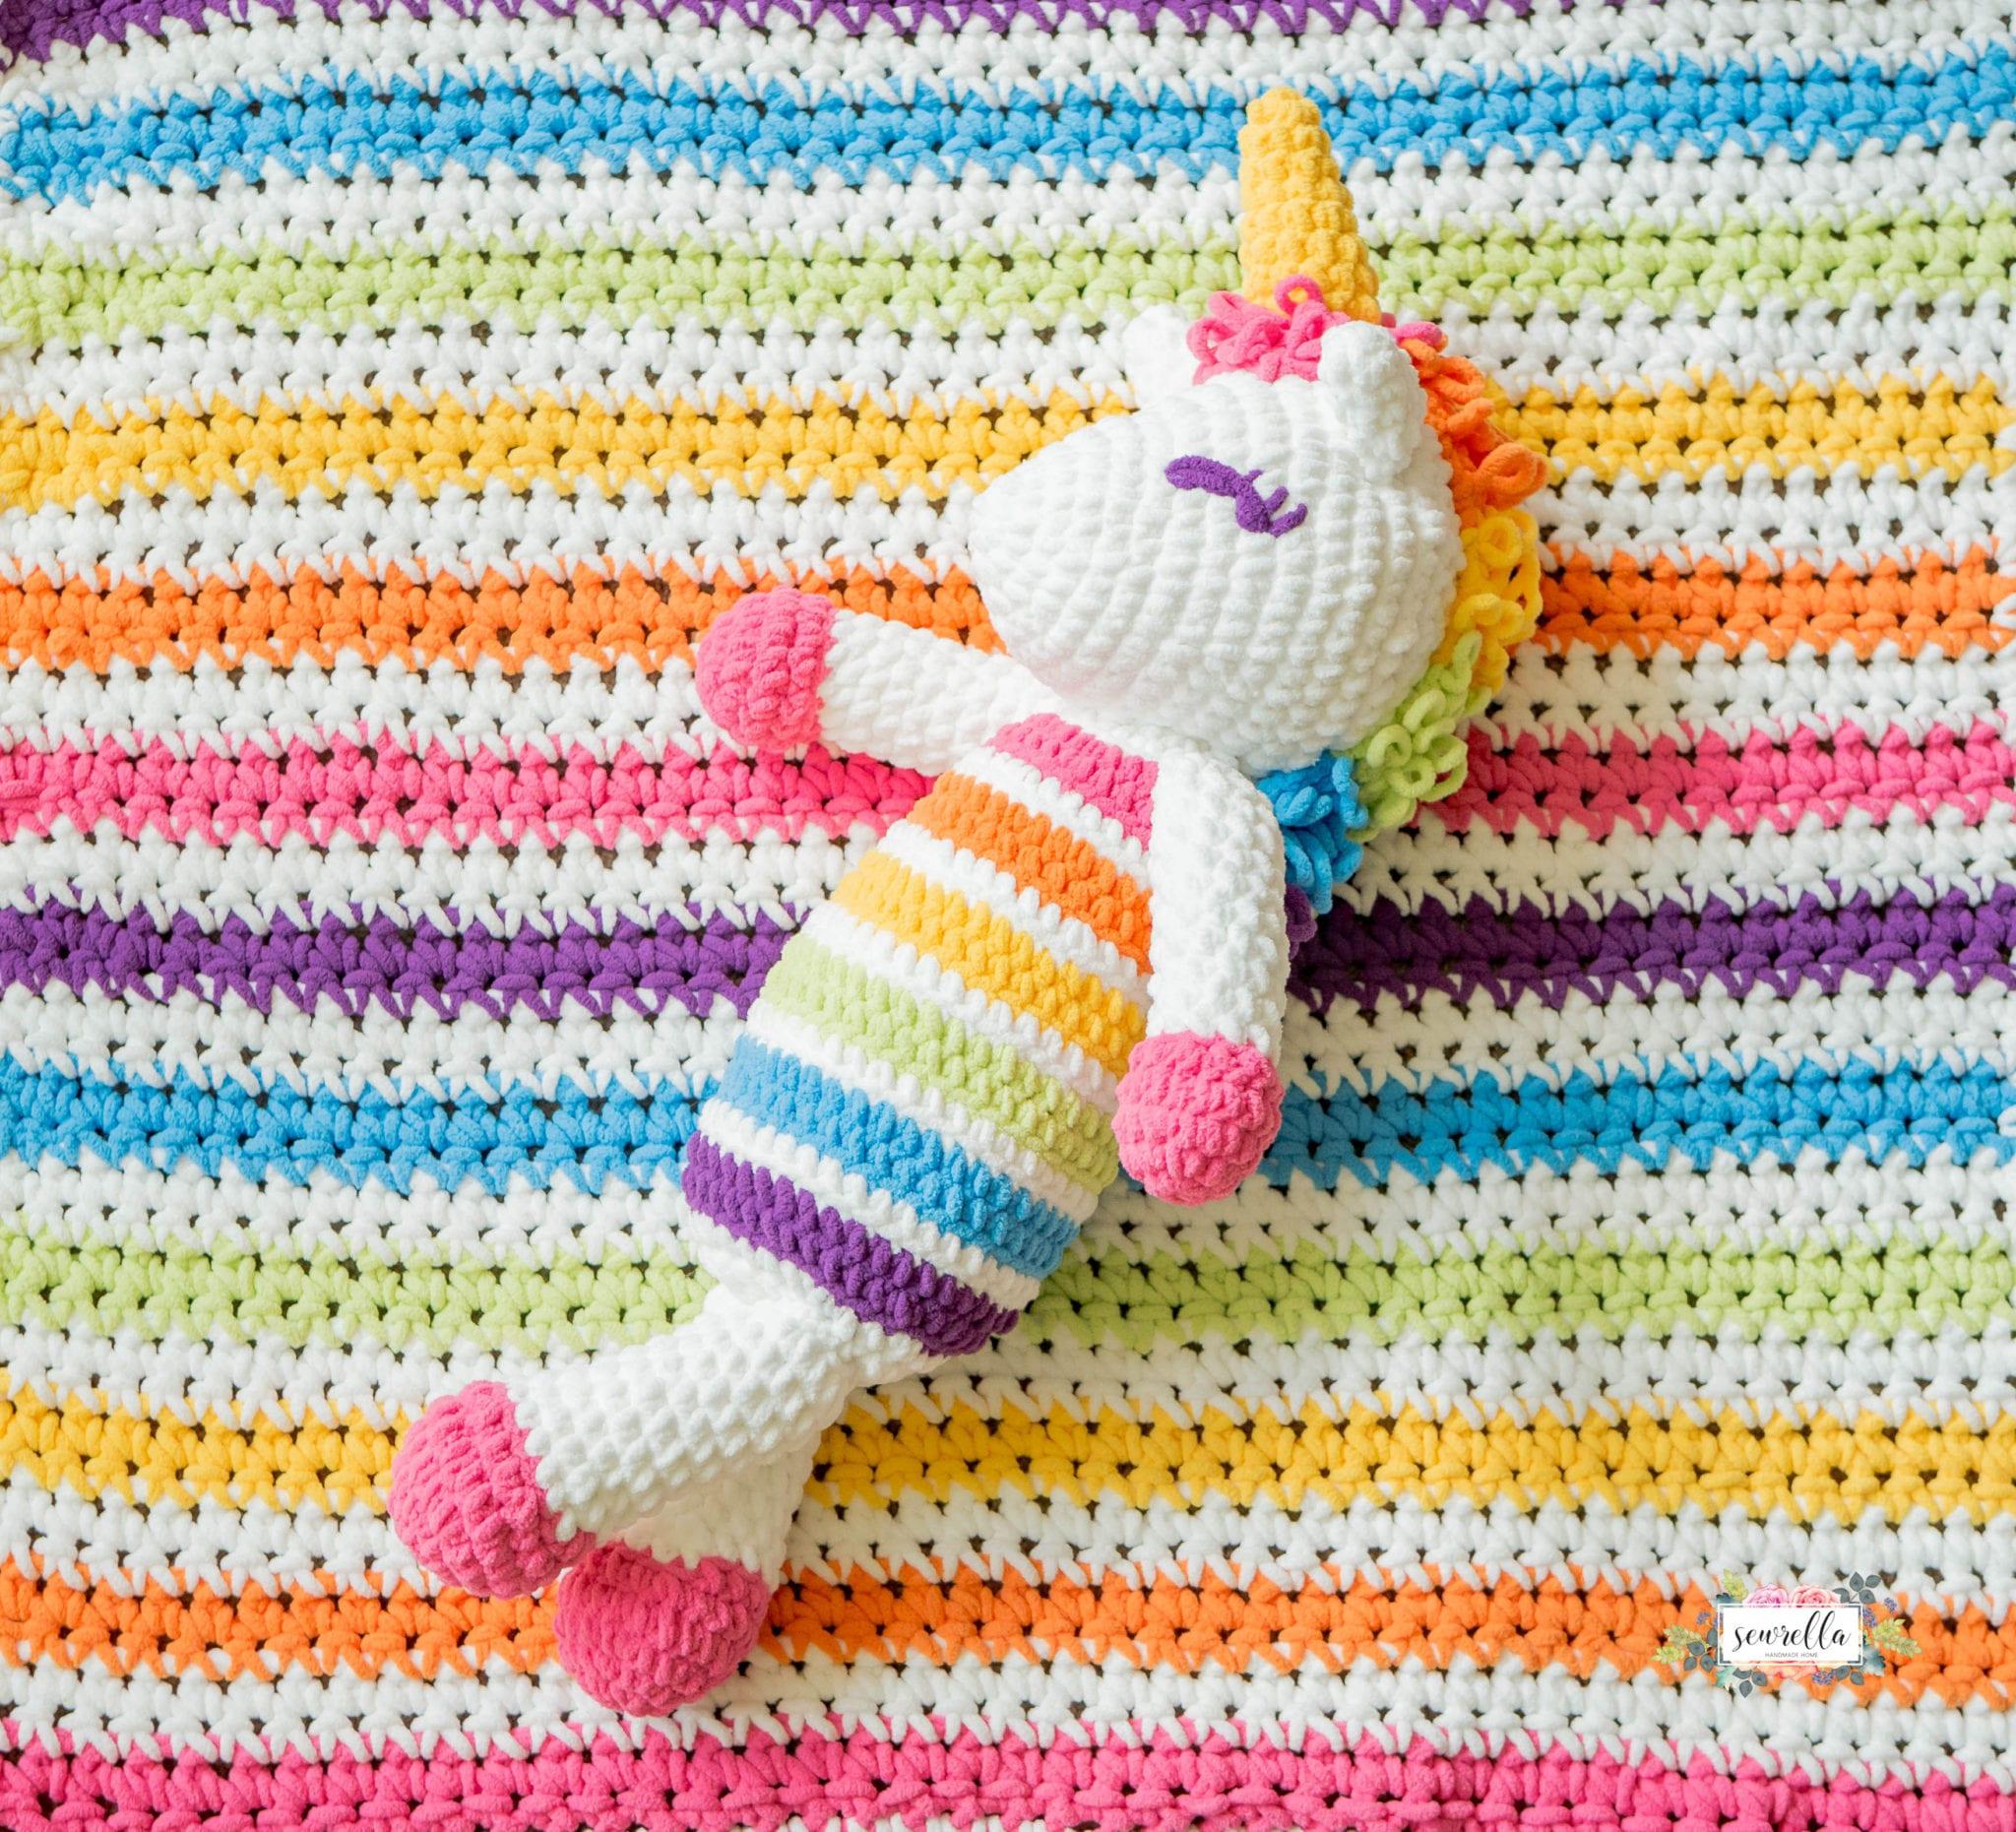 Lola the Crochet Plushy Unicorn - Sewrella